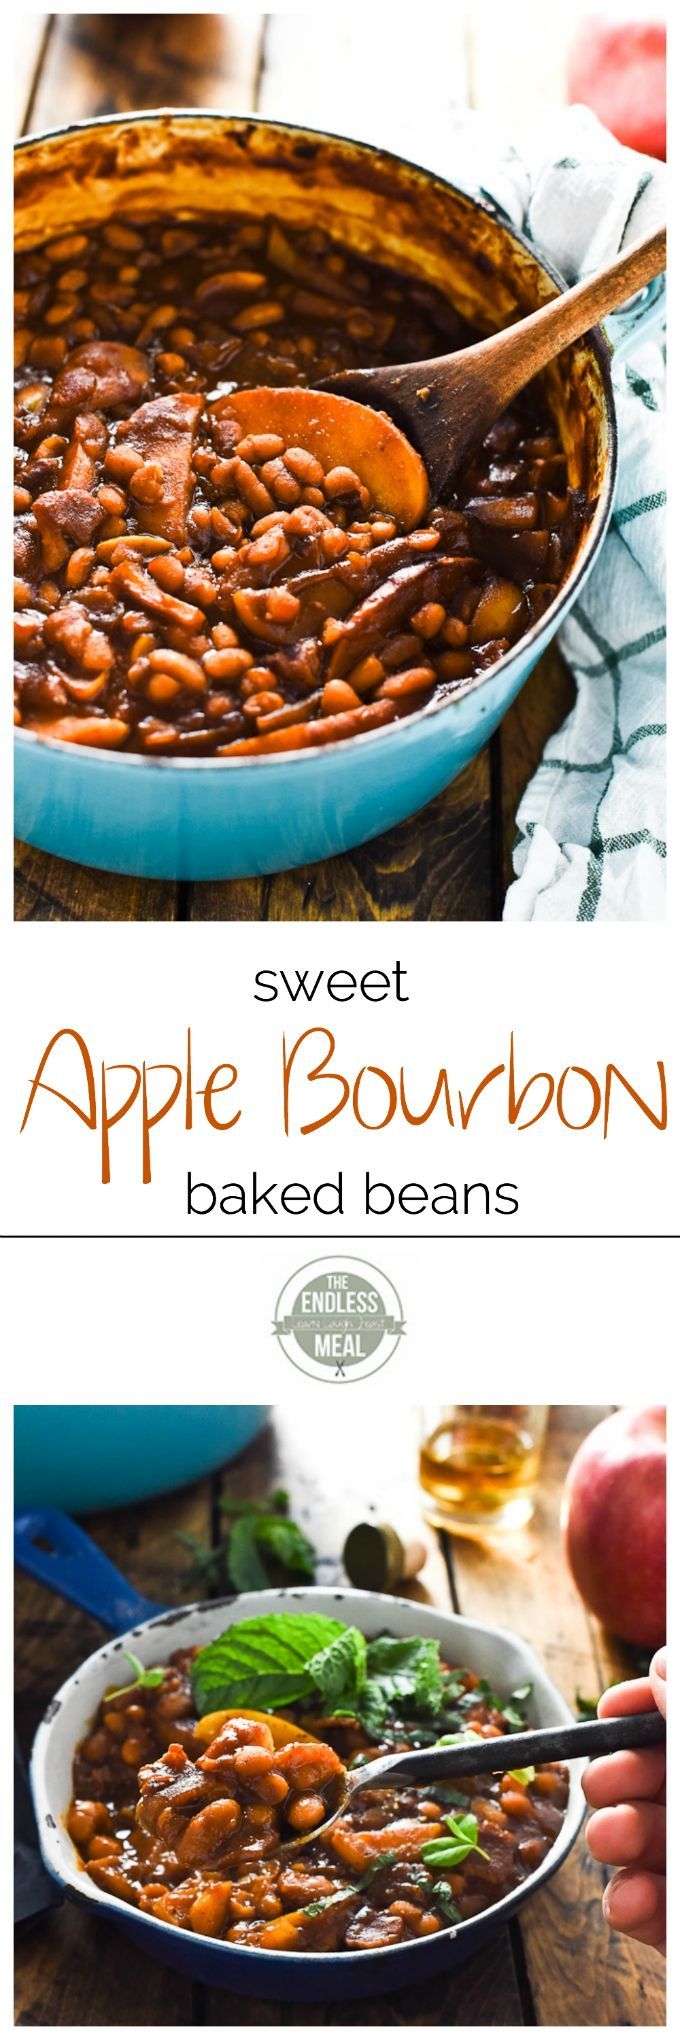 halloween baked beans ideas